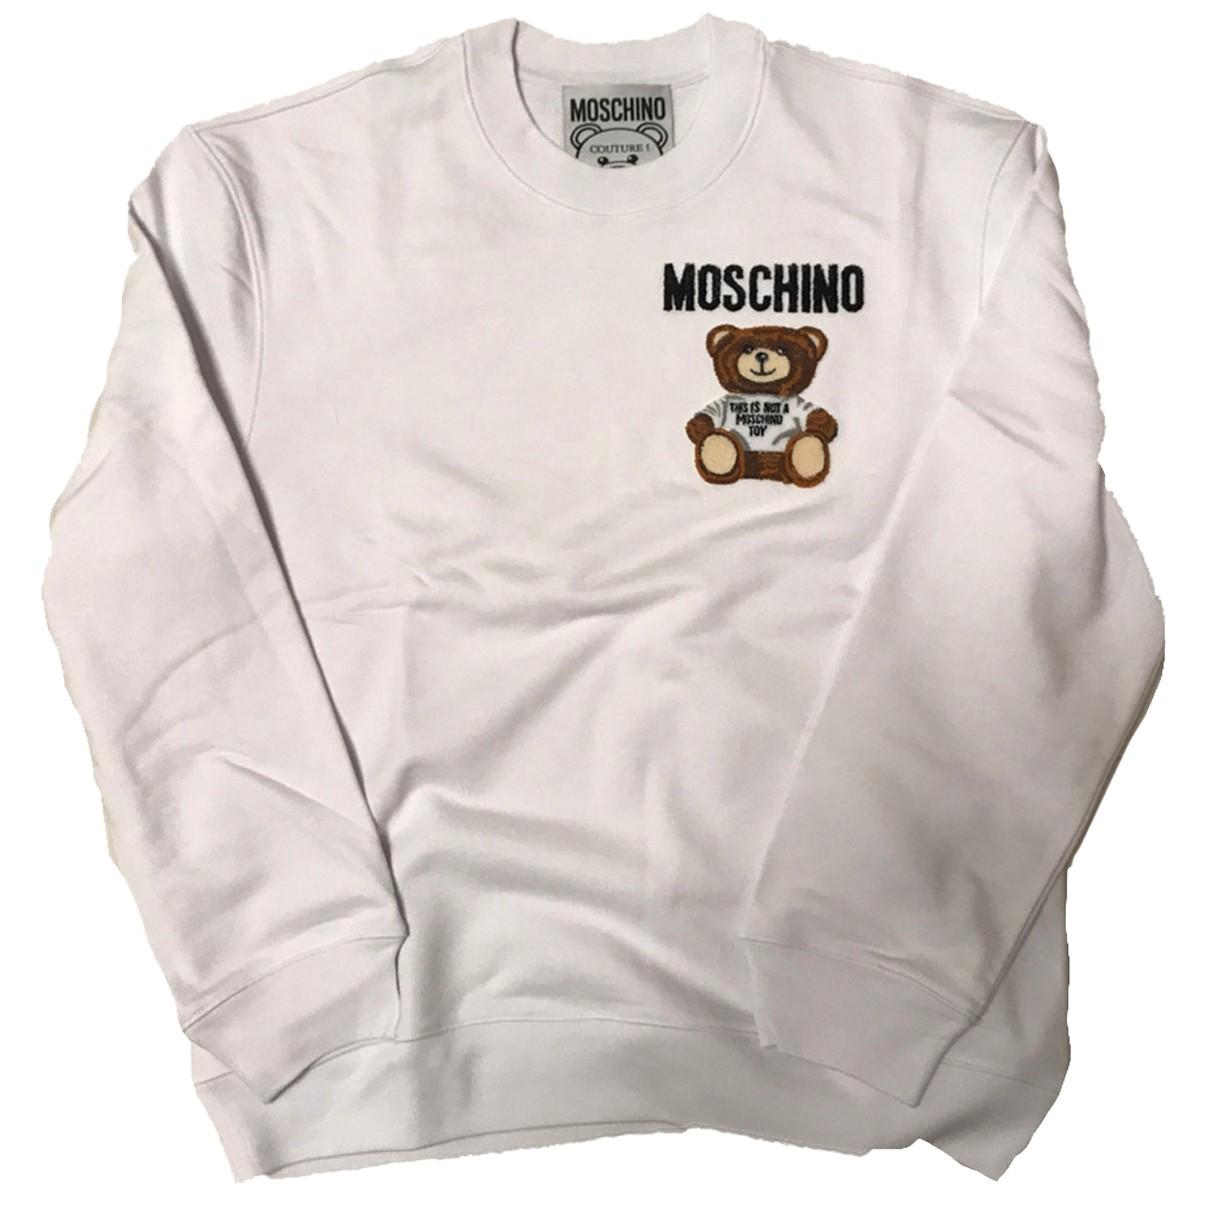 Moschino N White Cotton Knitwear for Women M International